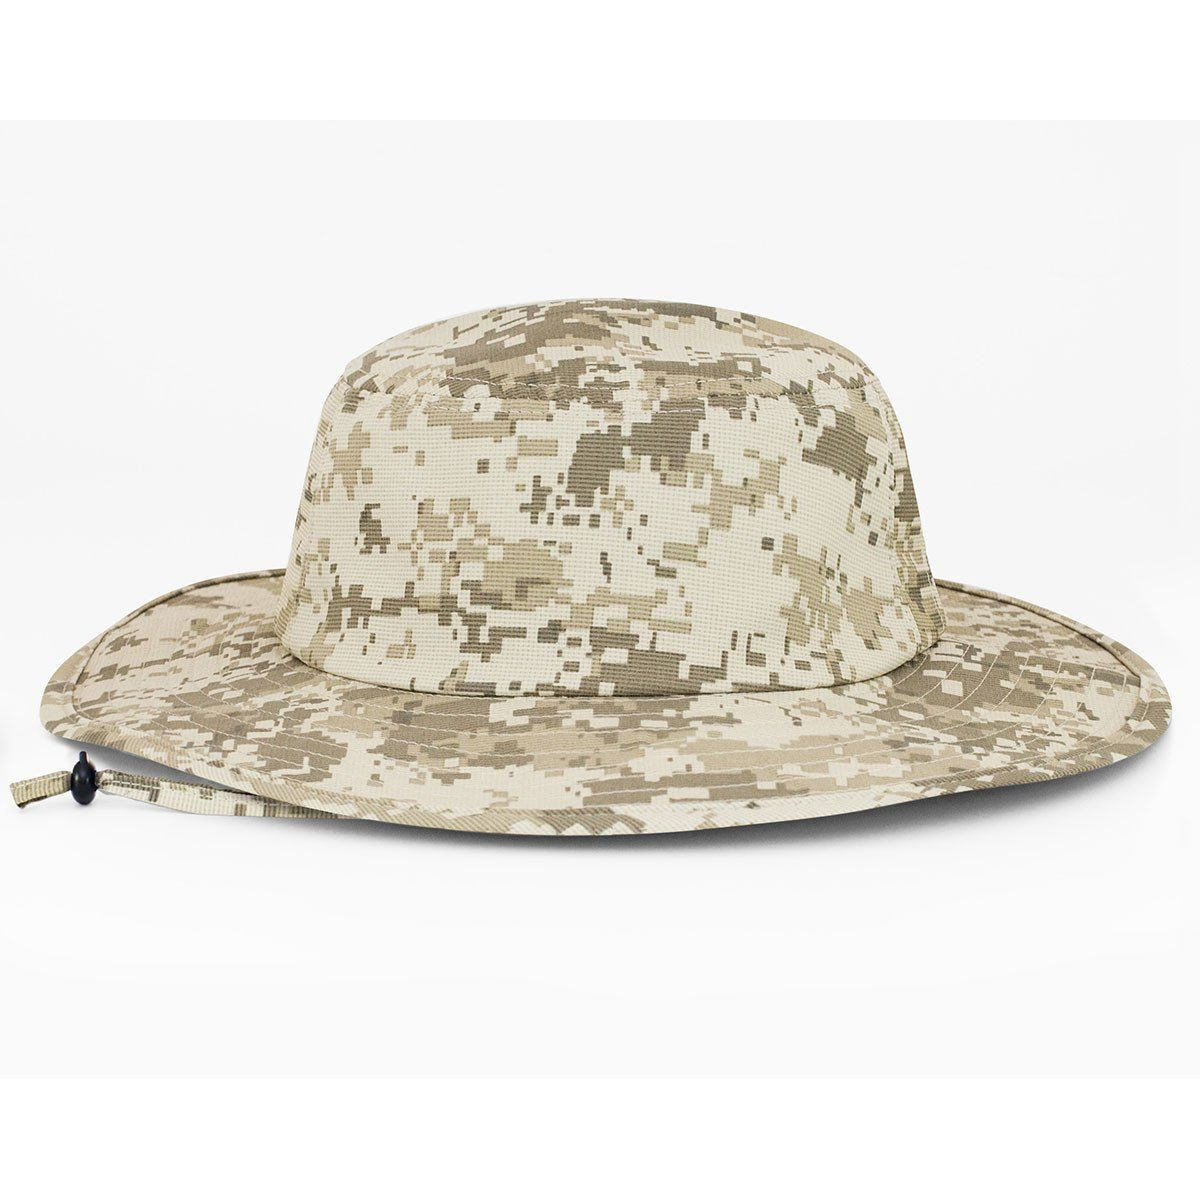 fa2f2a8a7c5 Pacific Headwear Desert Camo Manta Ray Boonie Hat